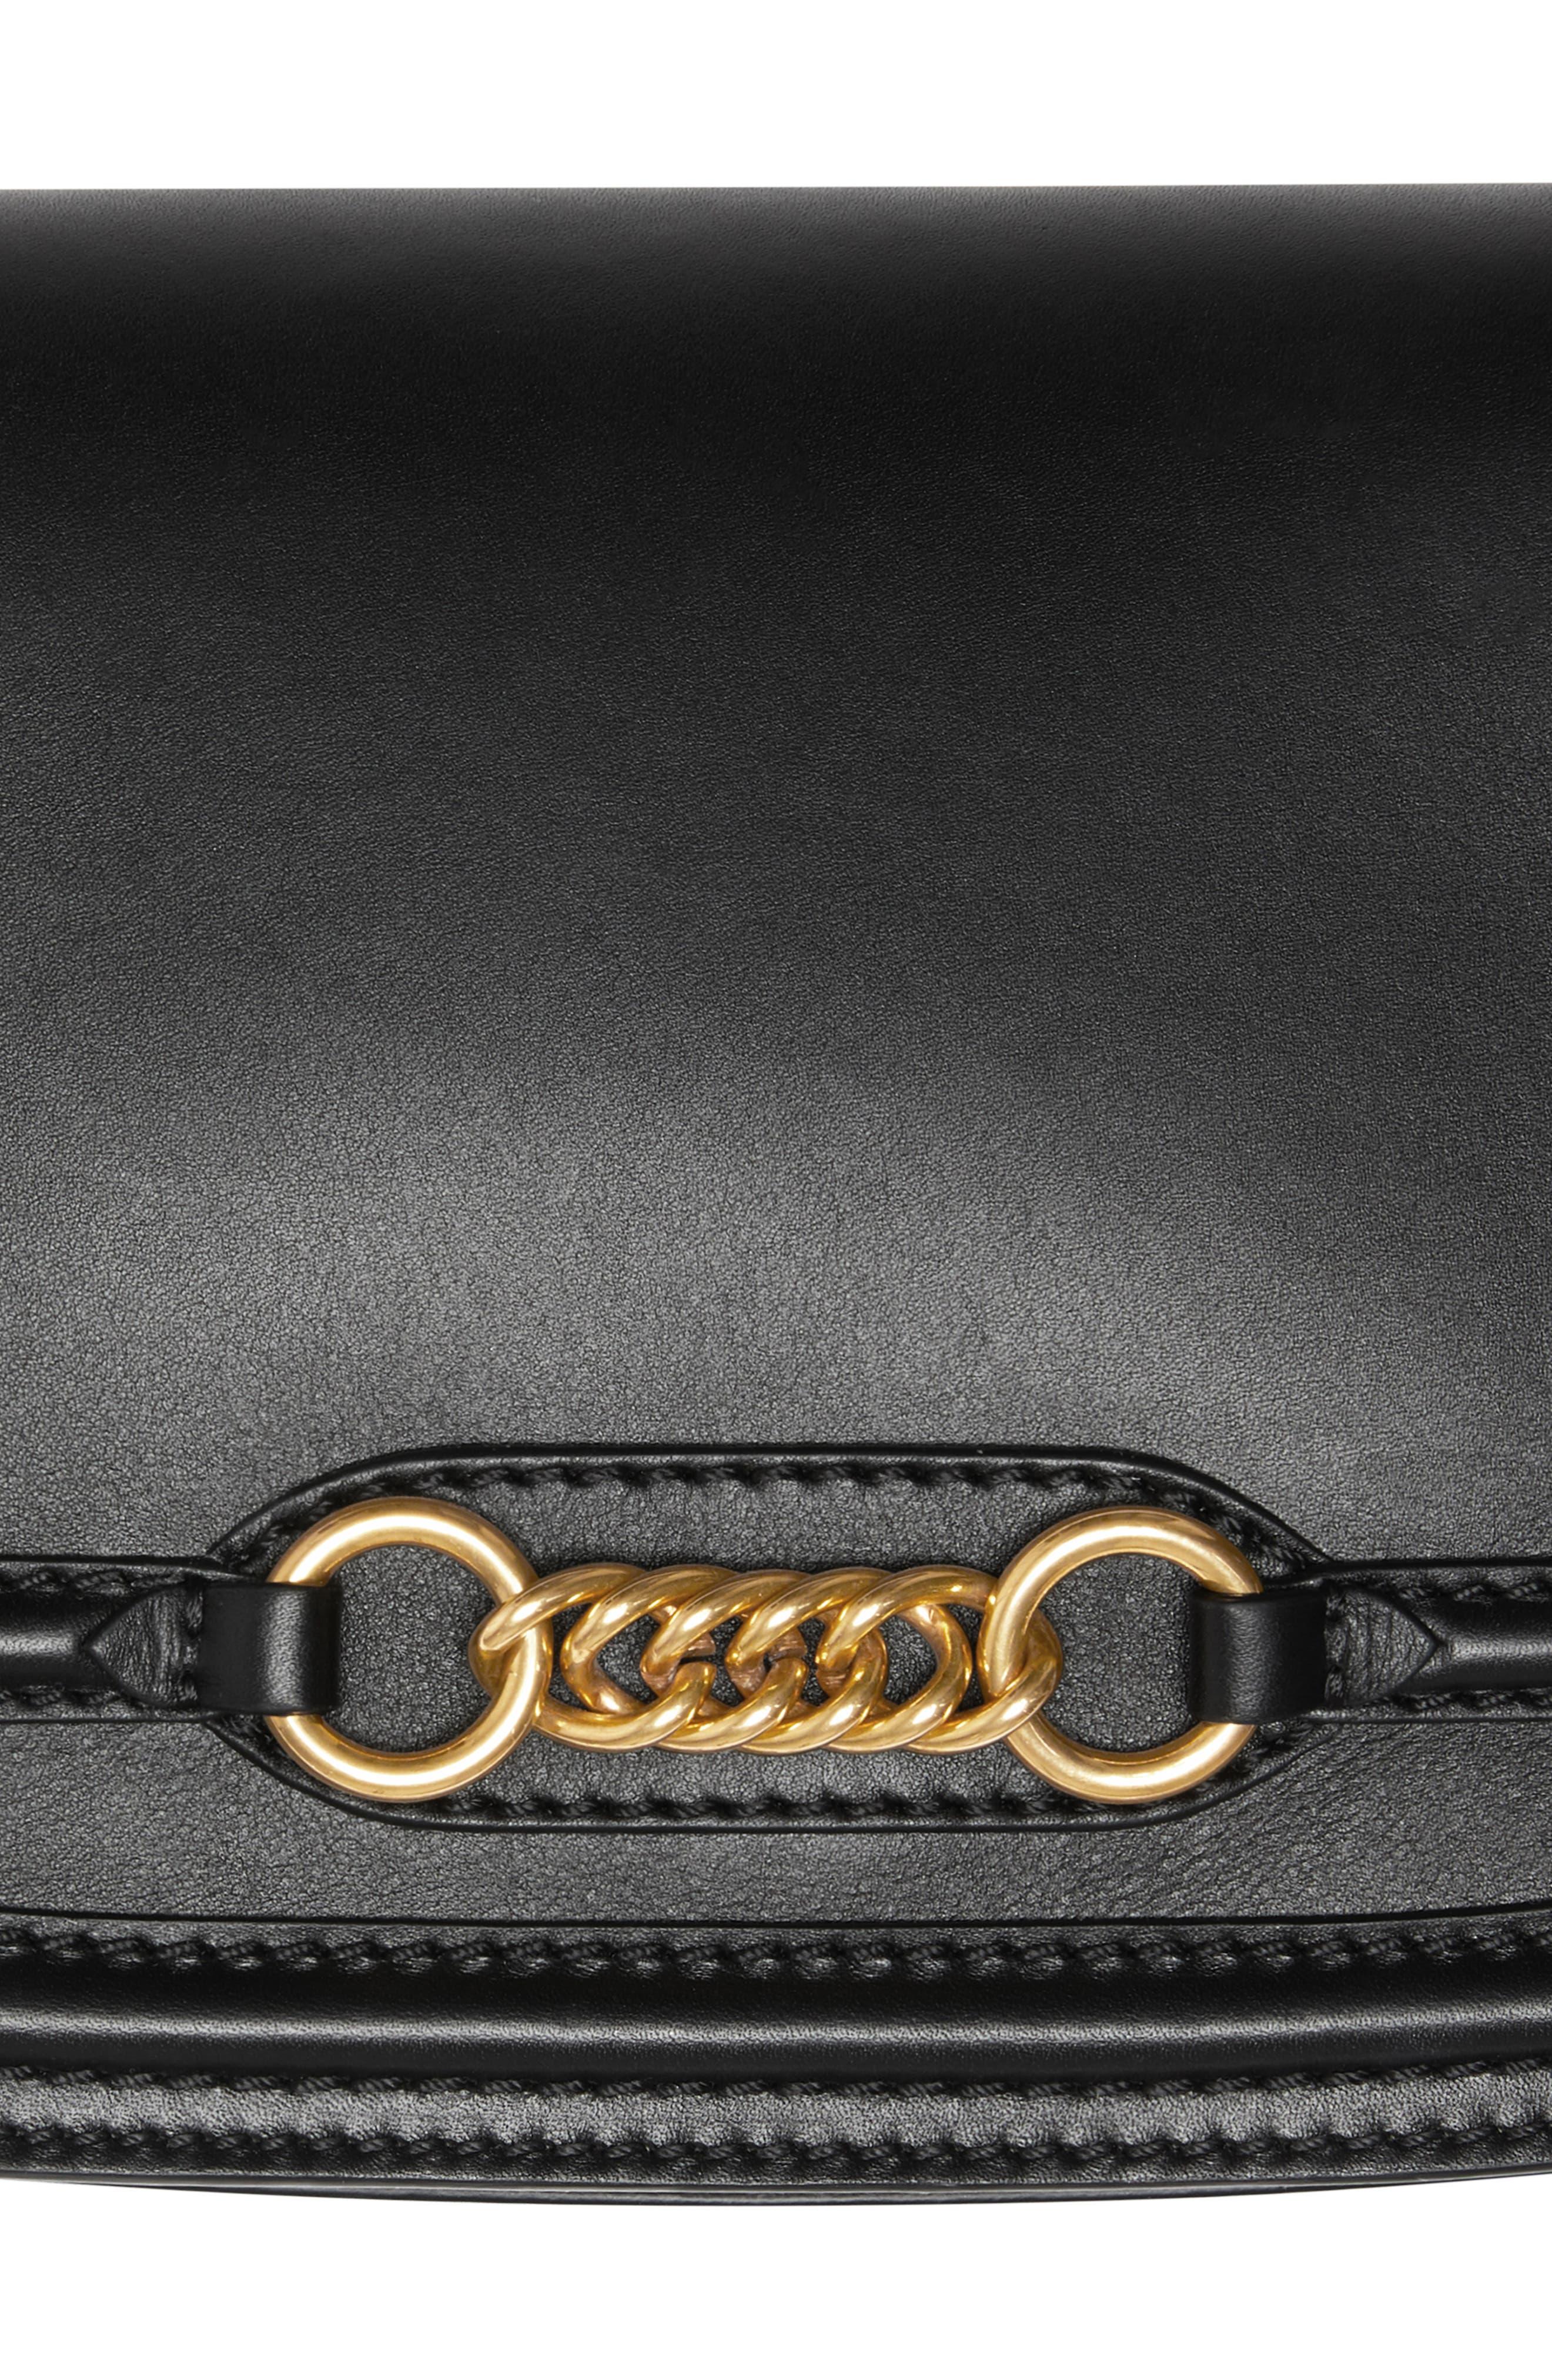 Link Flap Leather Crossbody Bag,                             Alternate thumbnail 6, color,                             BLACK